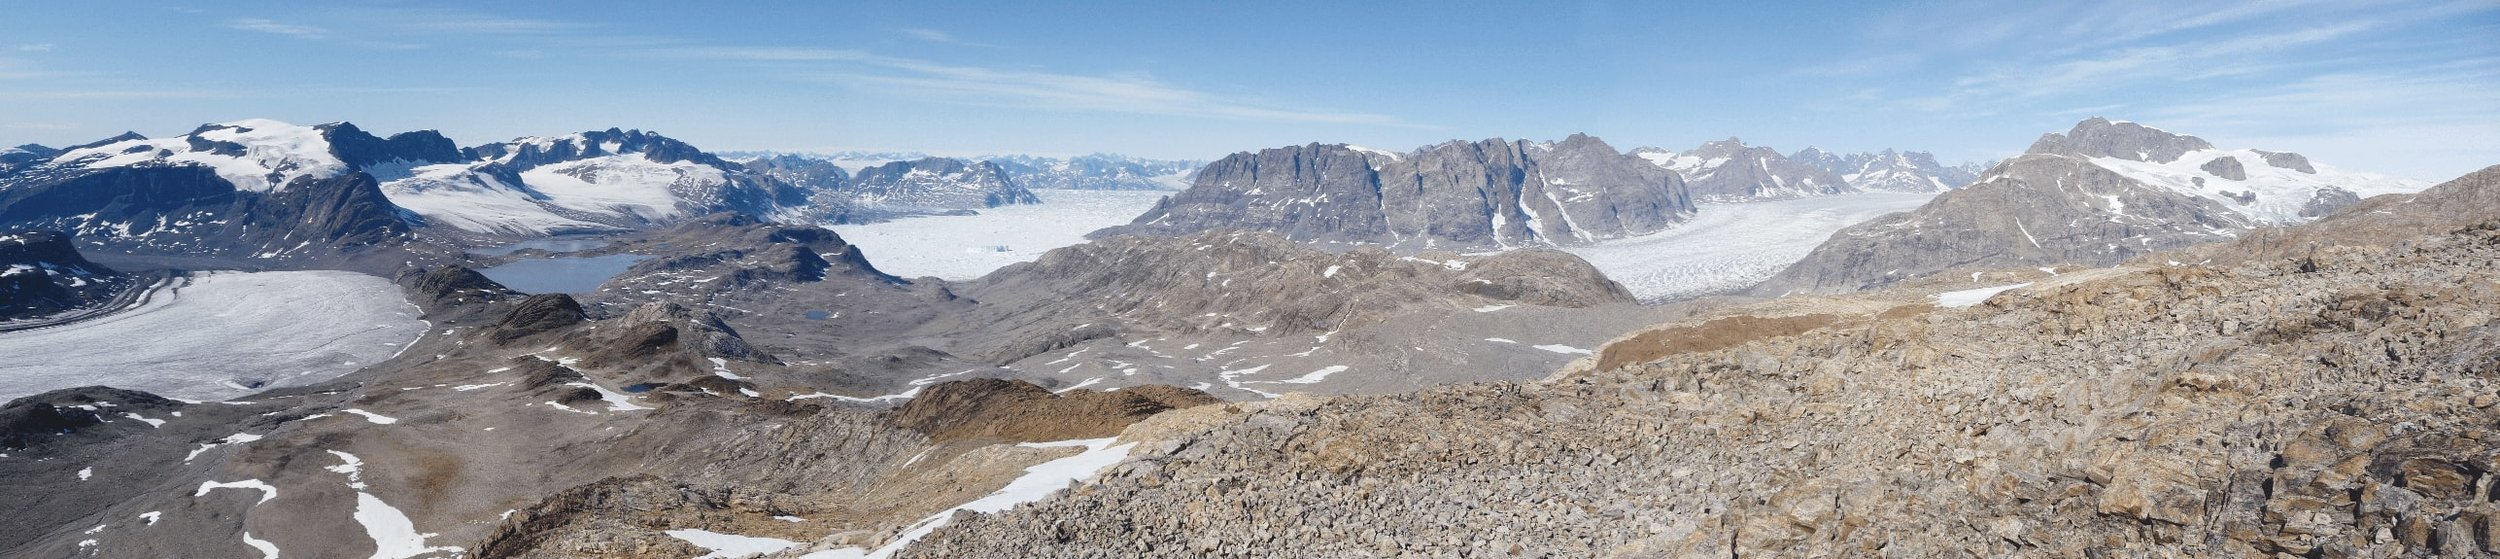 ryberg - Greenland (100%* Volcanic)